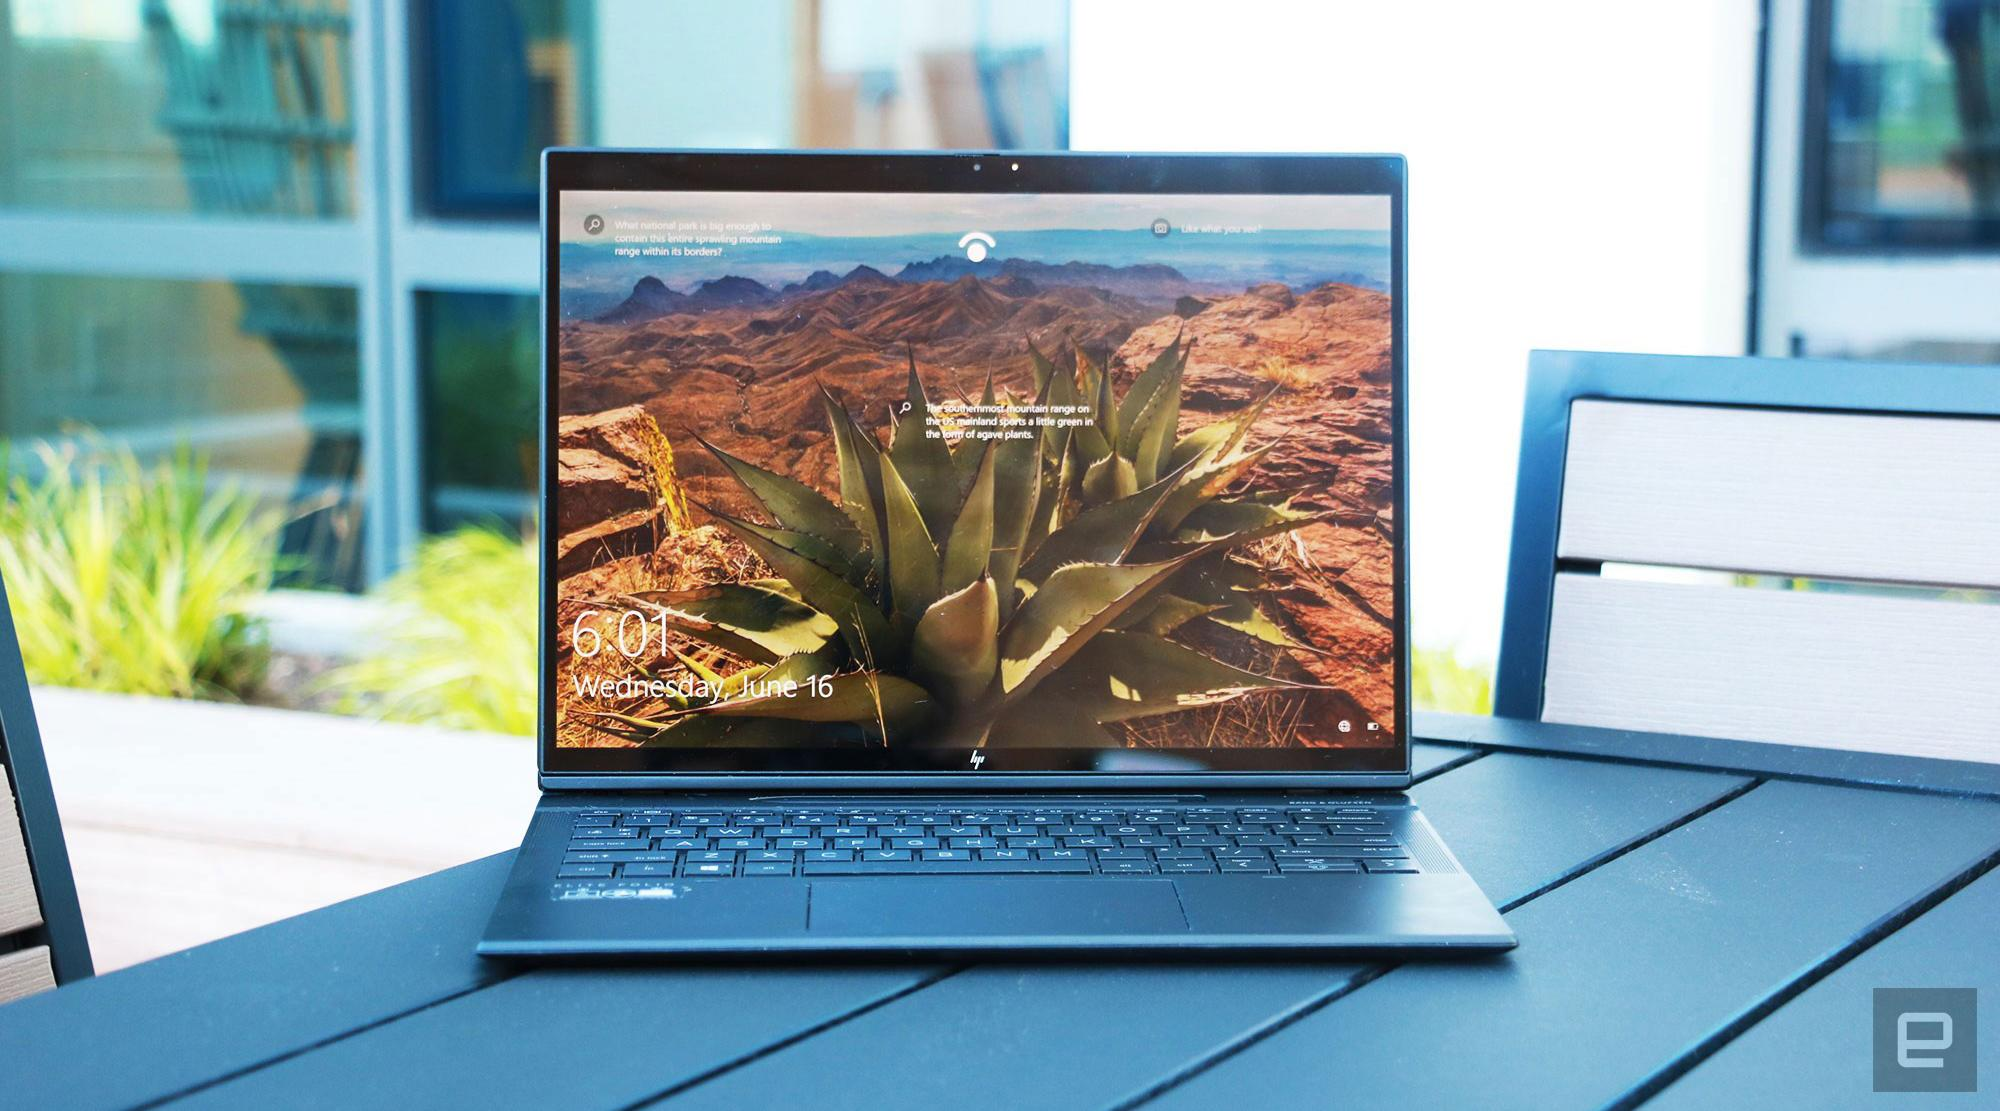 The HP Elite Folio laptop on a patio table.